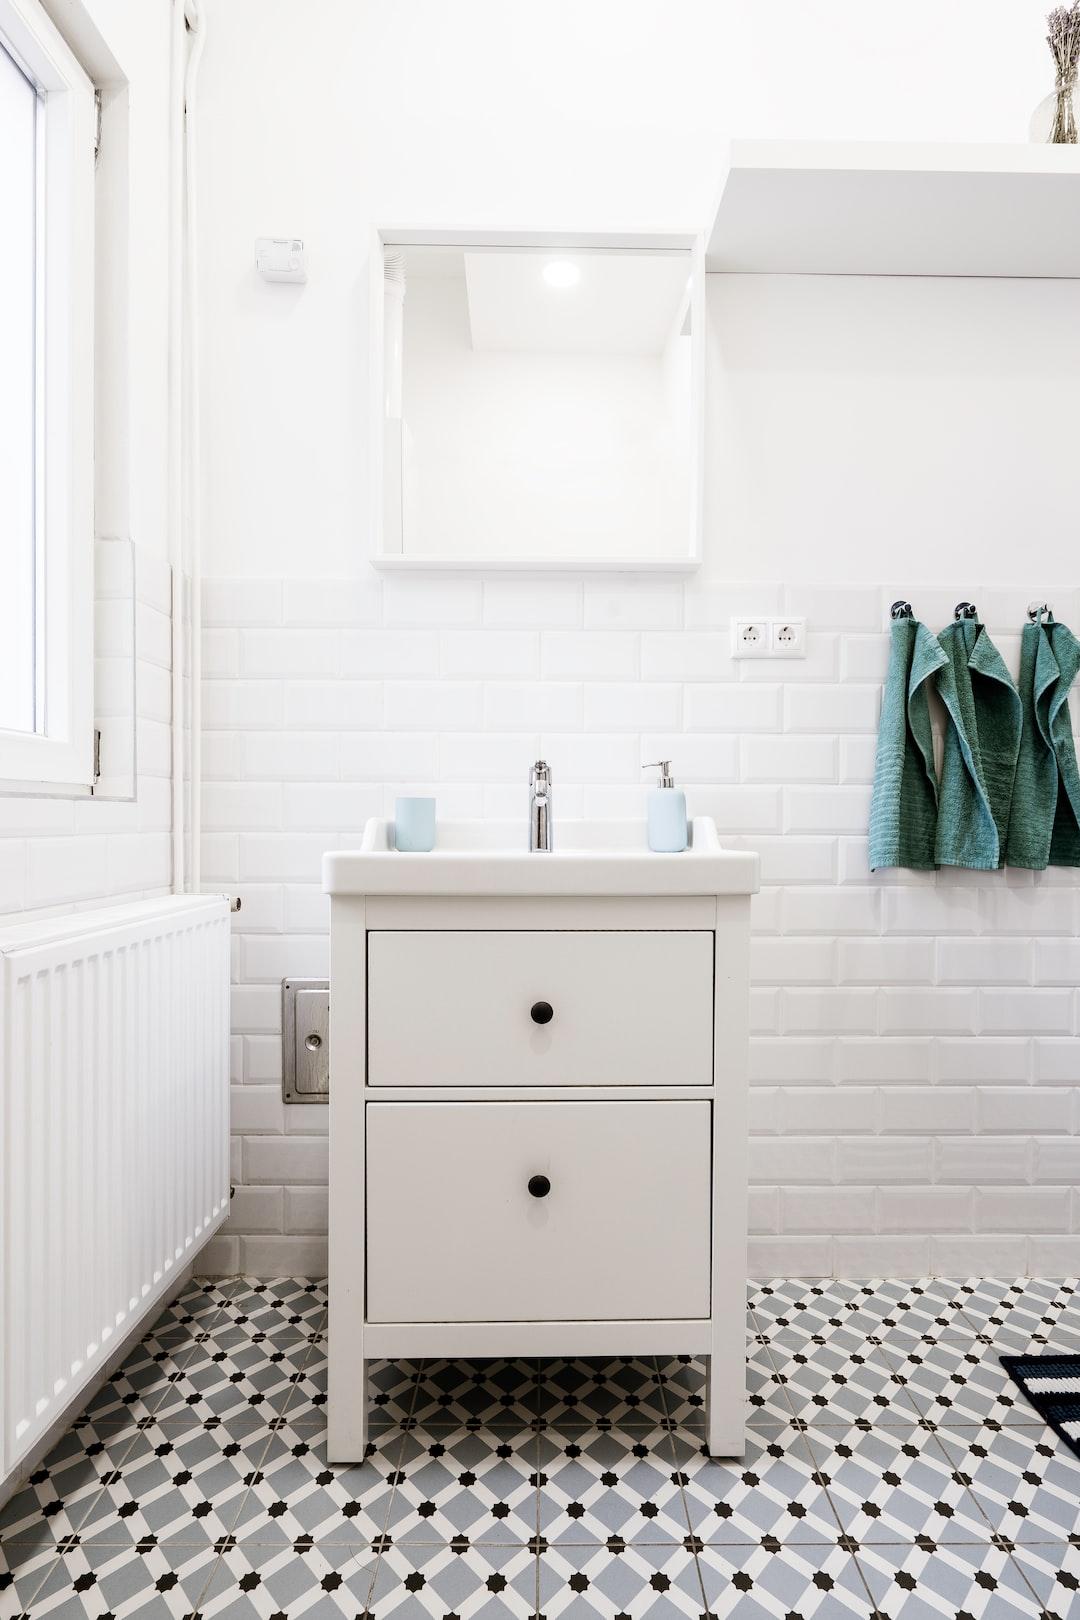 100+ Bathroom Pictures   Download Free Images on Unsplash